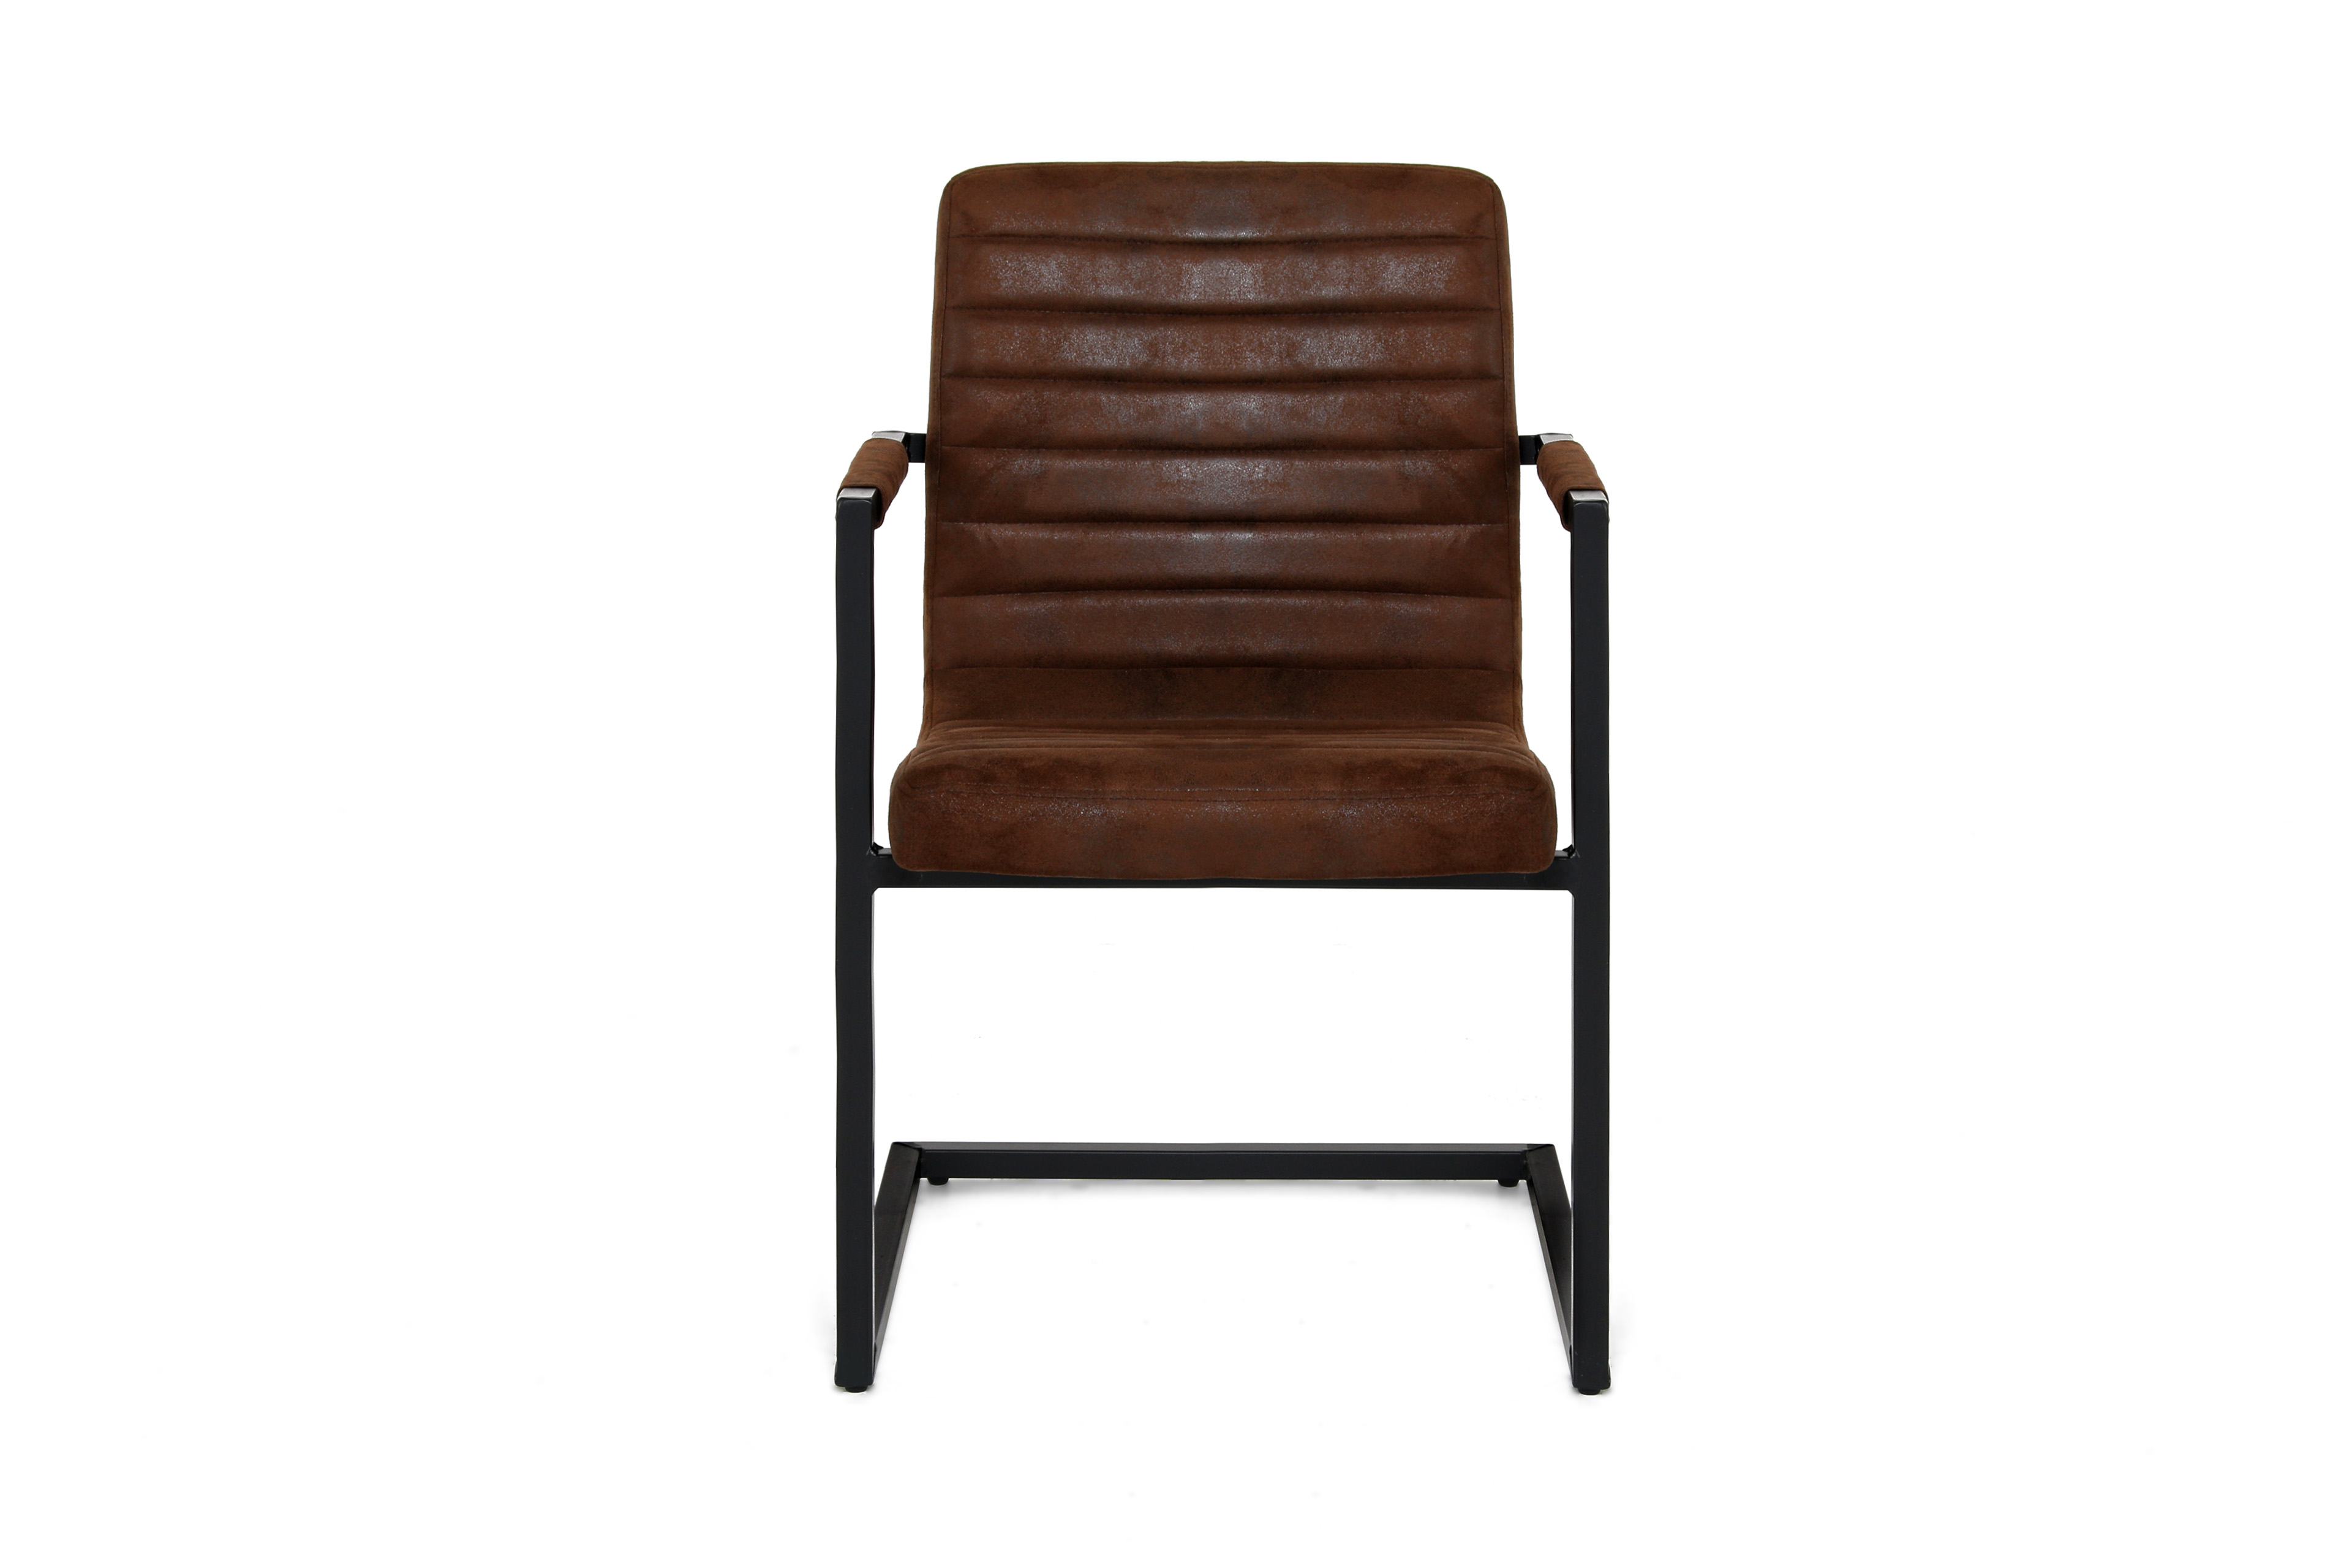 stuhl parzival braun m bel letz ihr online shop. Black Bedroom Furniture Sets. Home Design Ideas